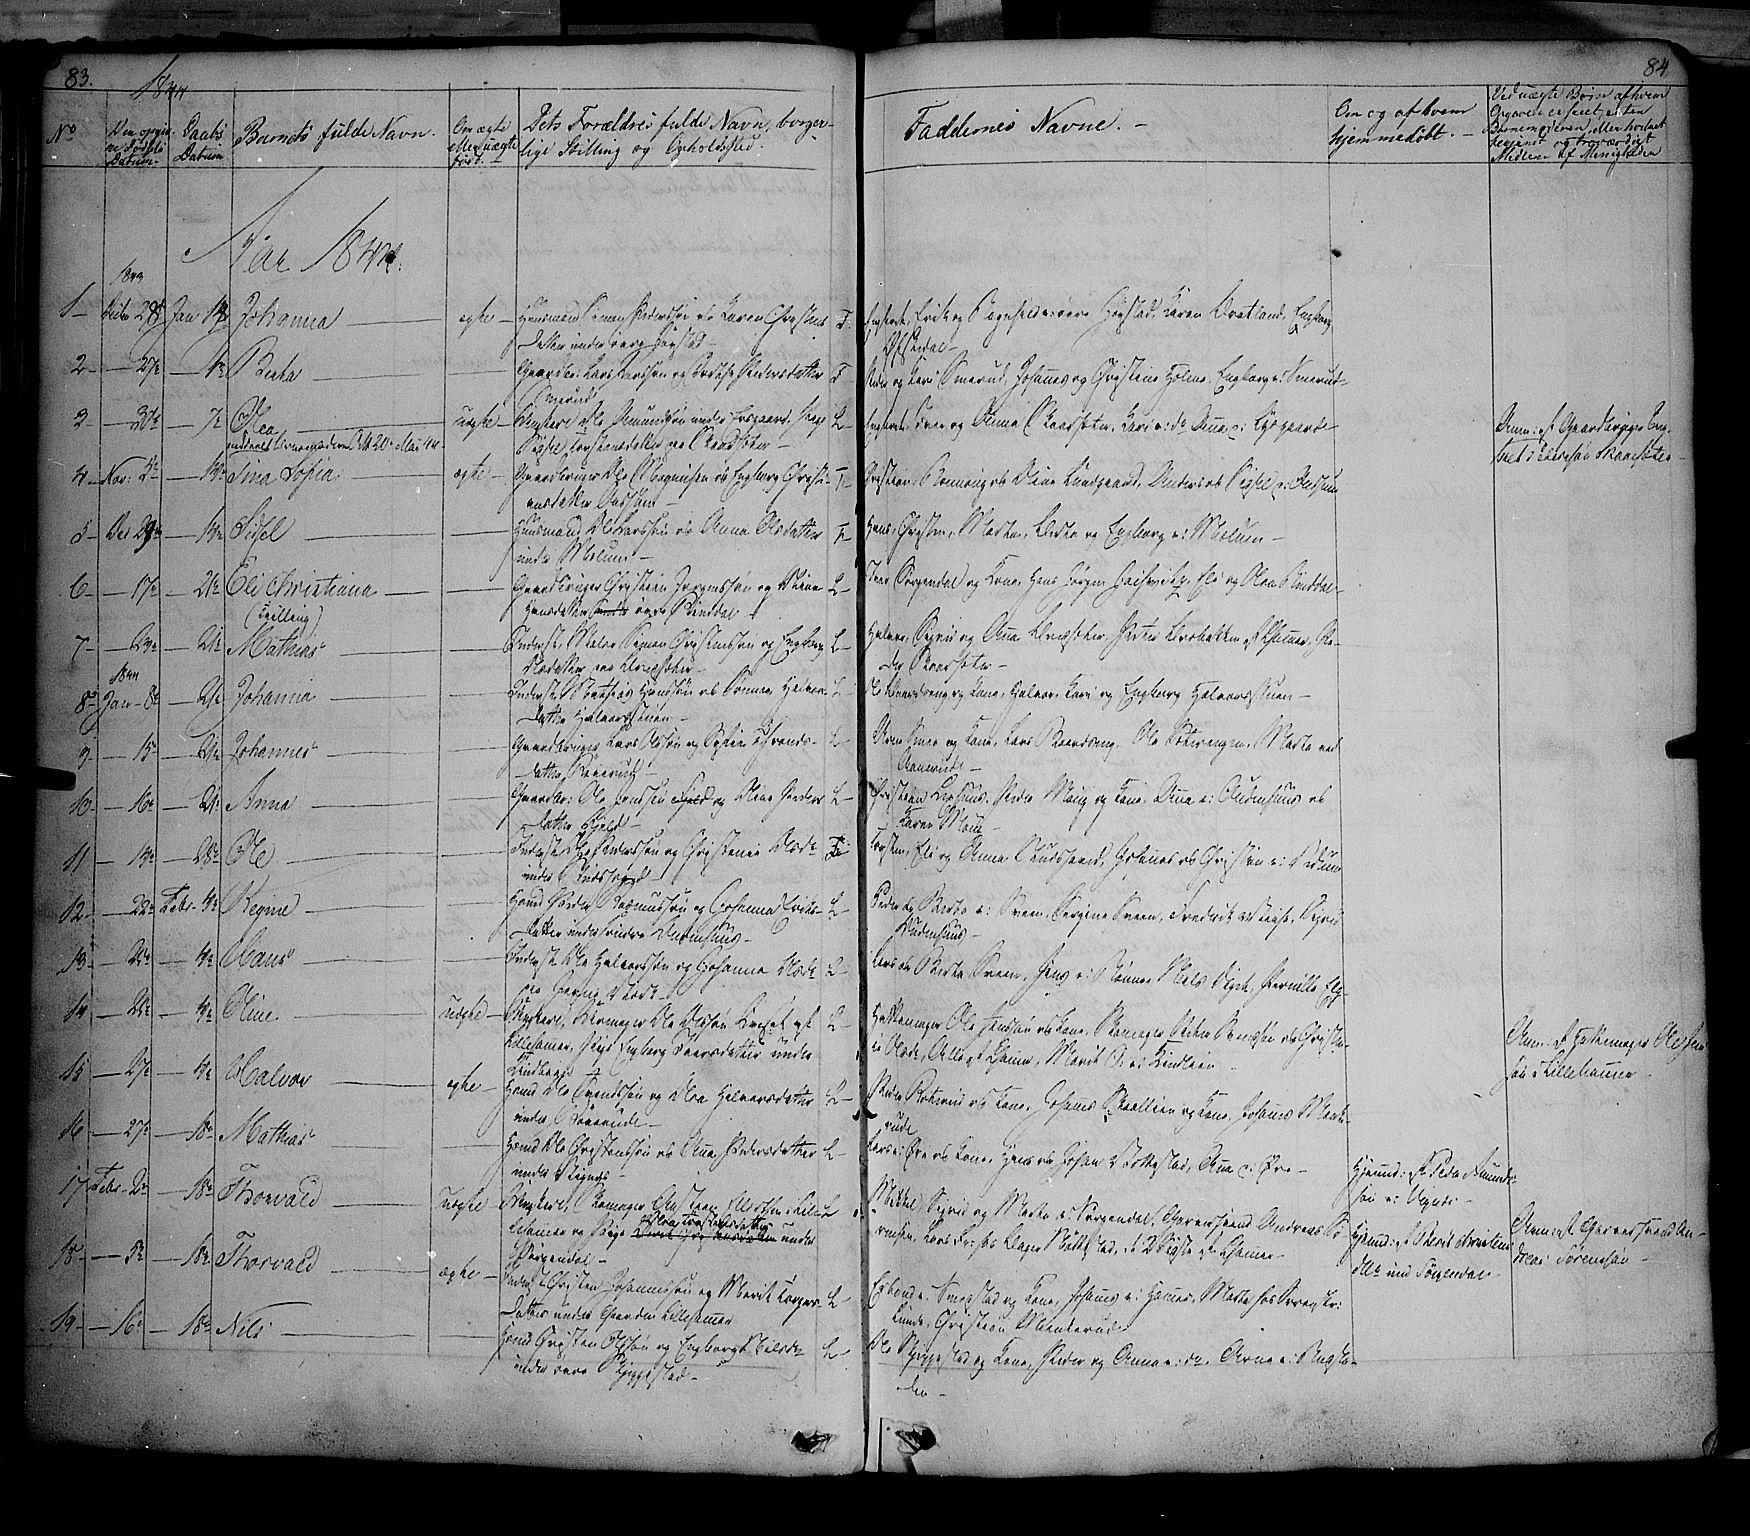 SAH, Fåberg prestekontor, Ministerialbok nr. 5, 1836-1854, s. 83-84